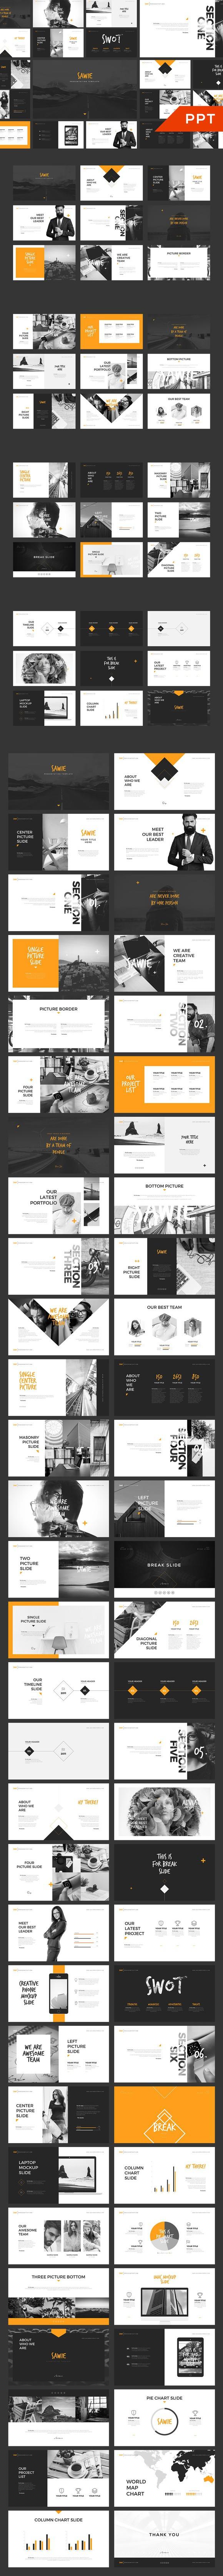 sawie powerpoint template | presentation templates | pinterest, Powerpoint templates